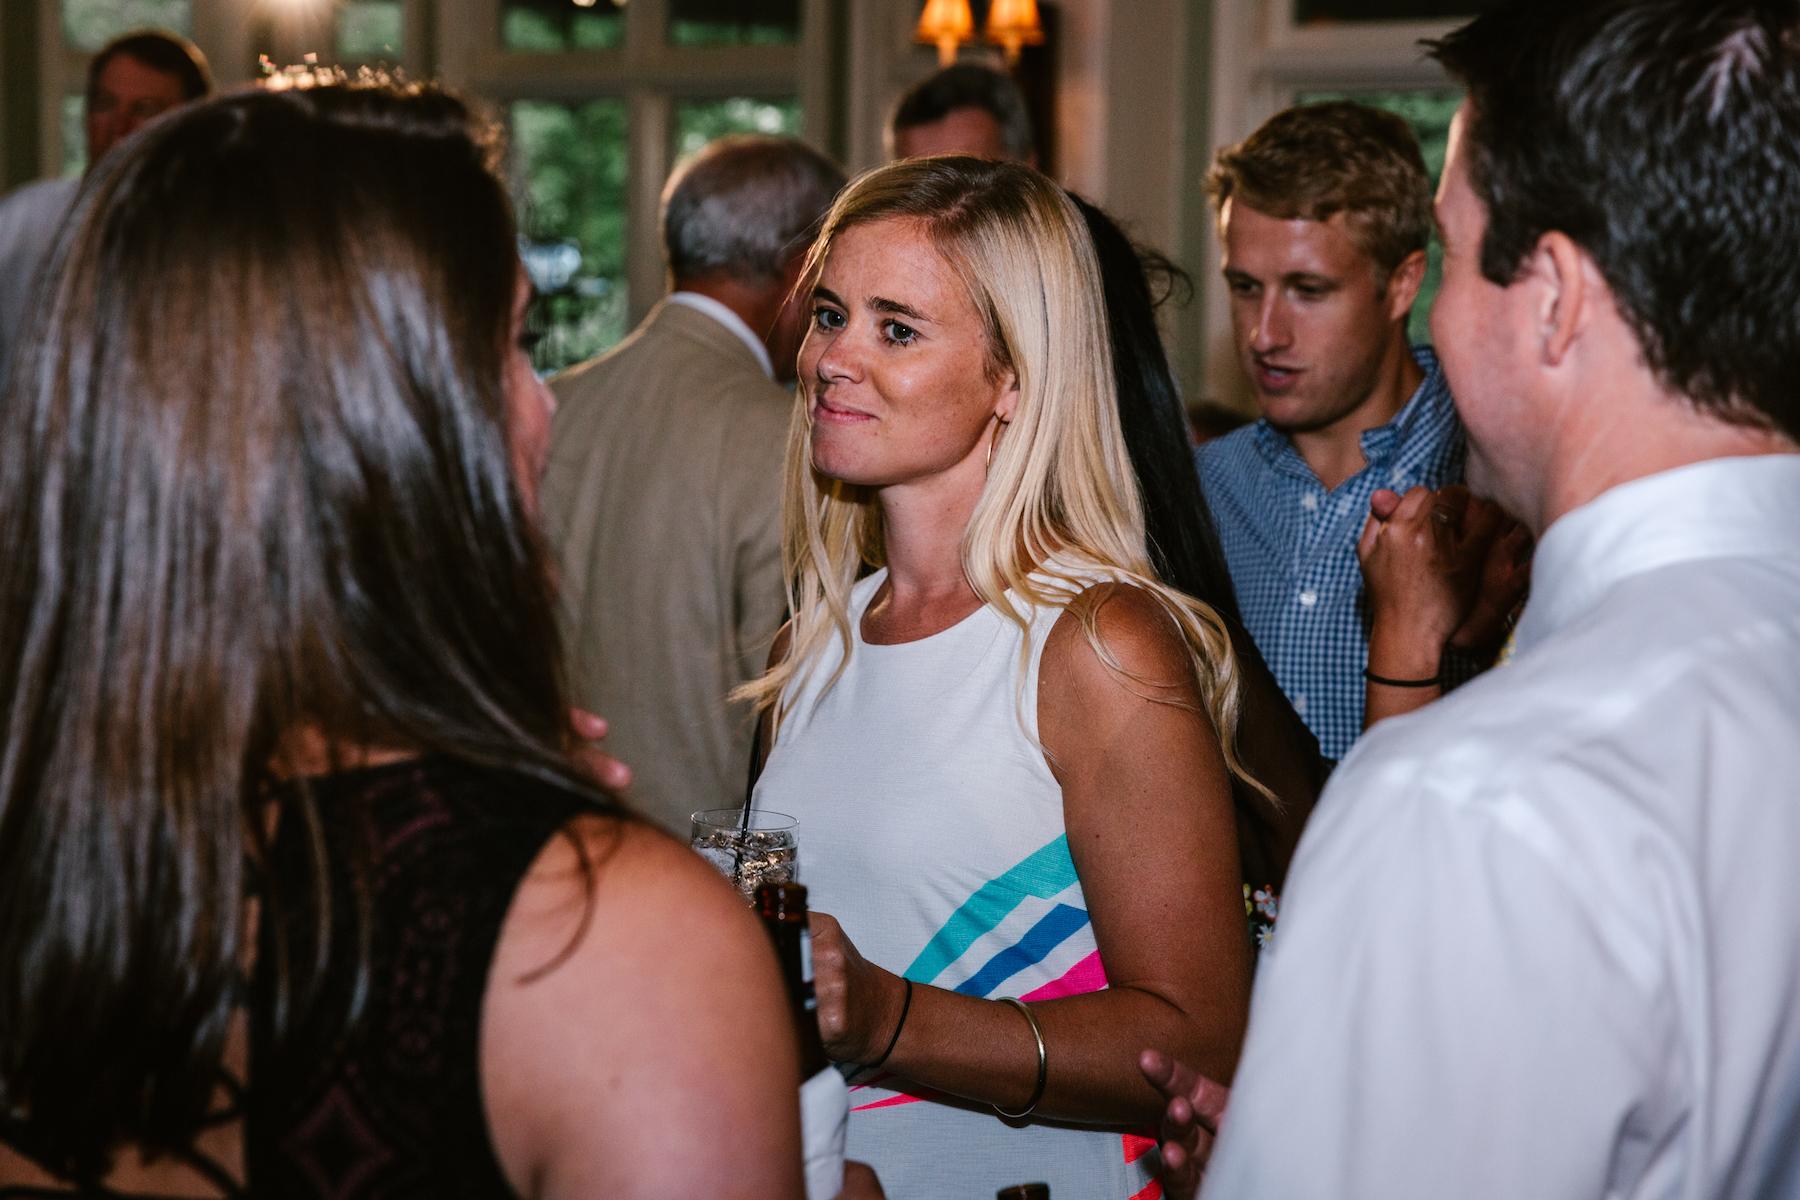 wedding-engagement-photographer-spartanburg-greenville-columbia-carolina-south-north-538.JPG